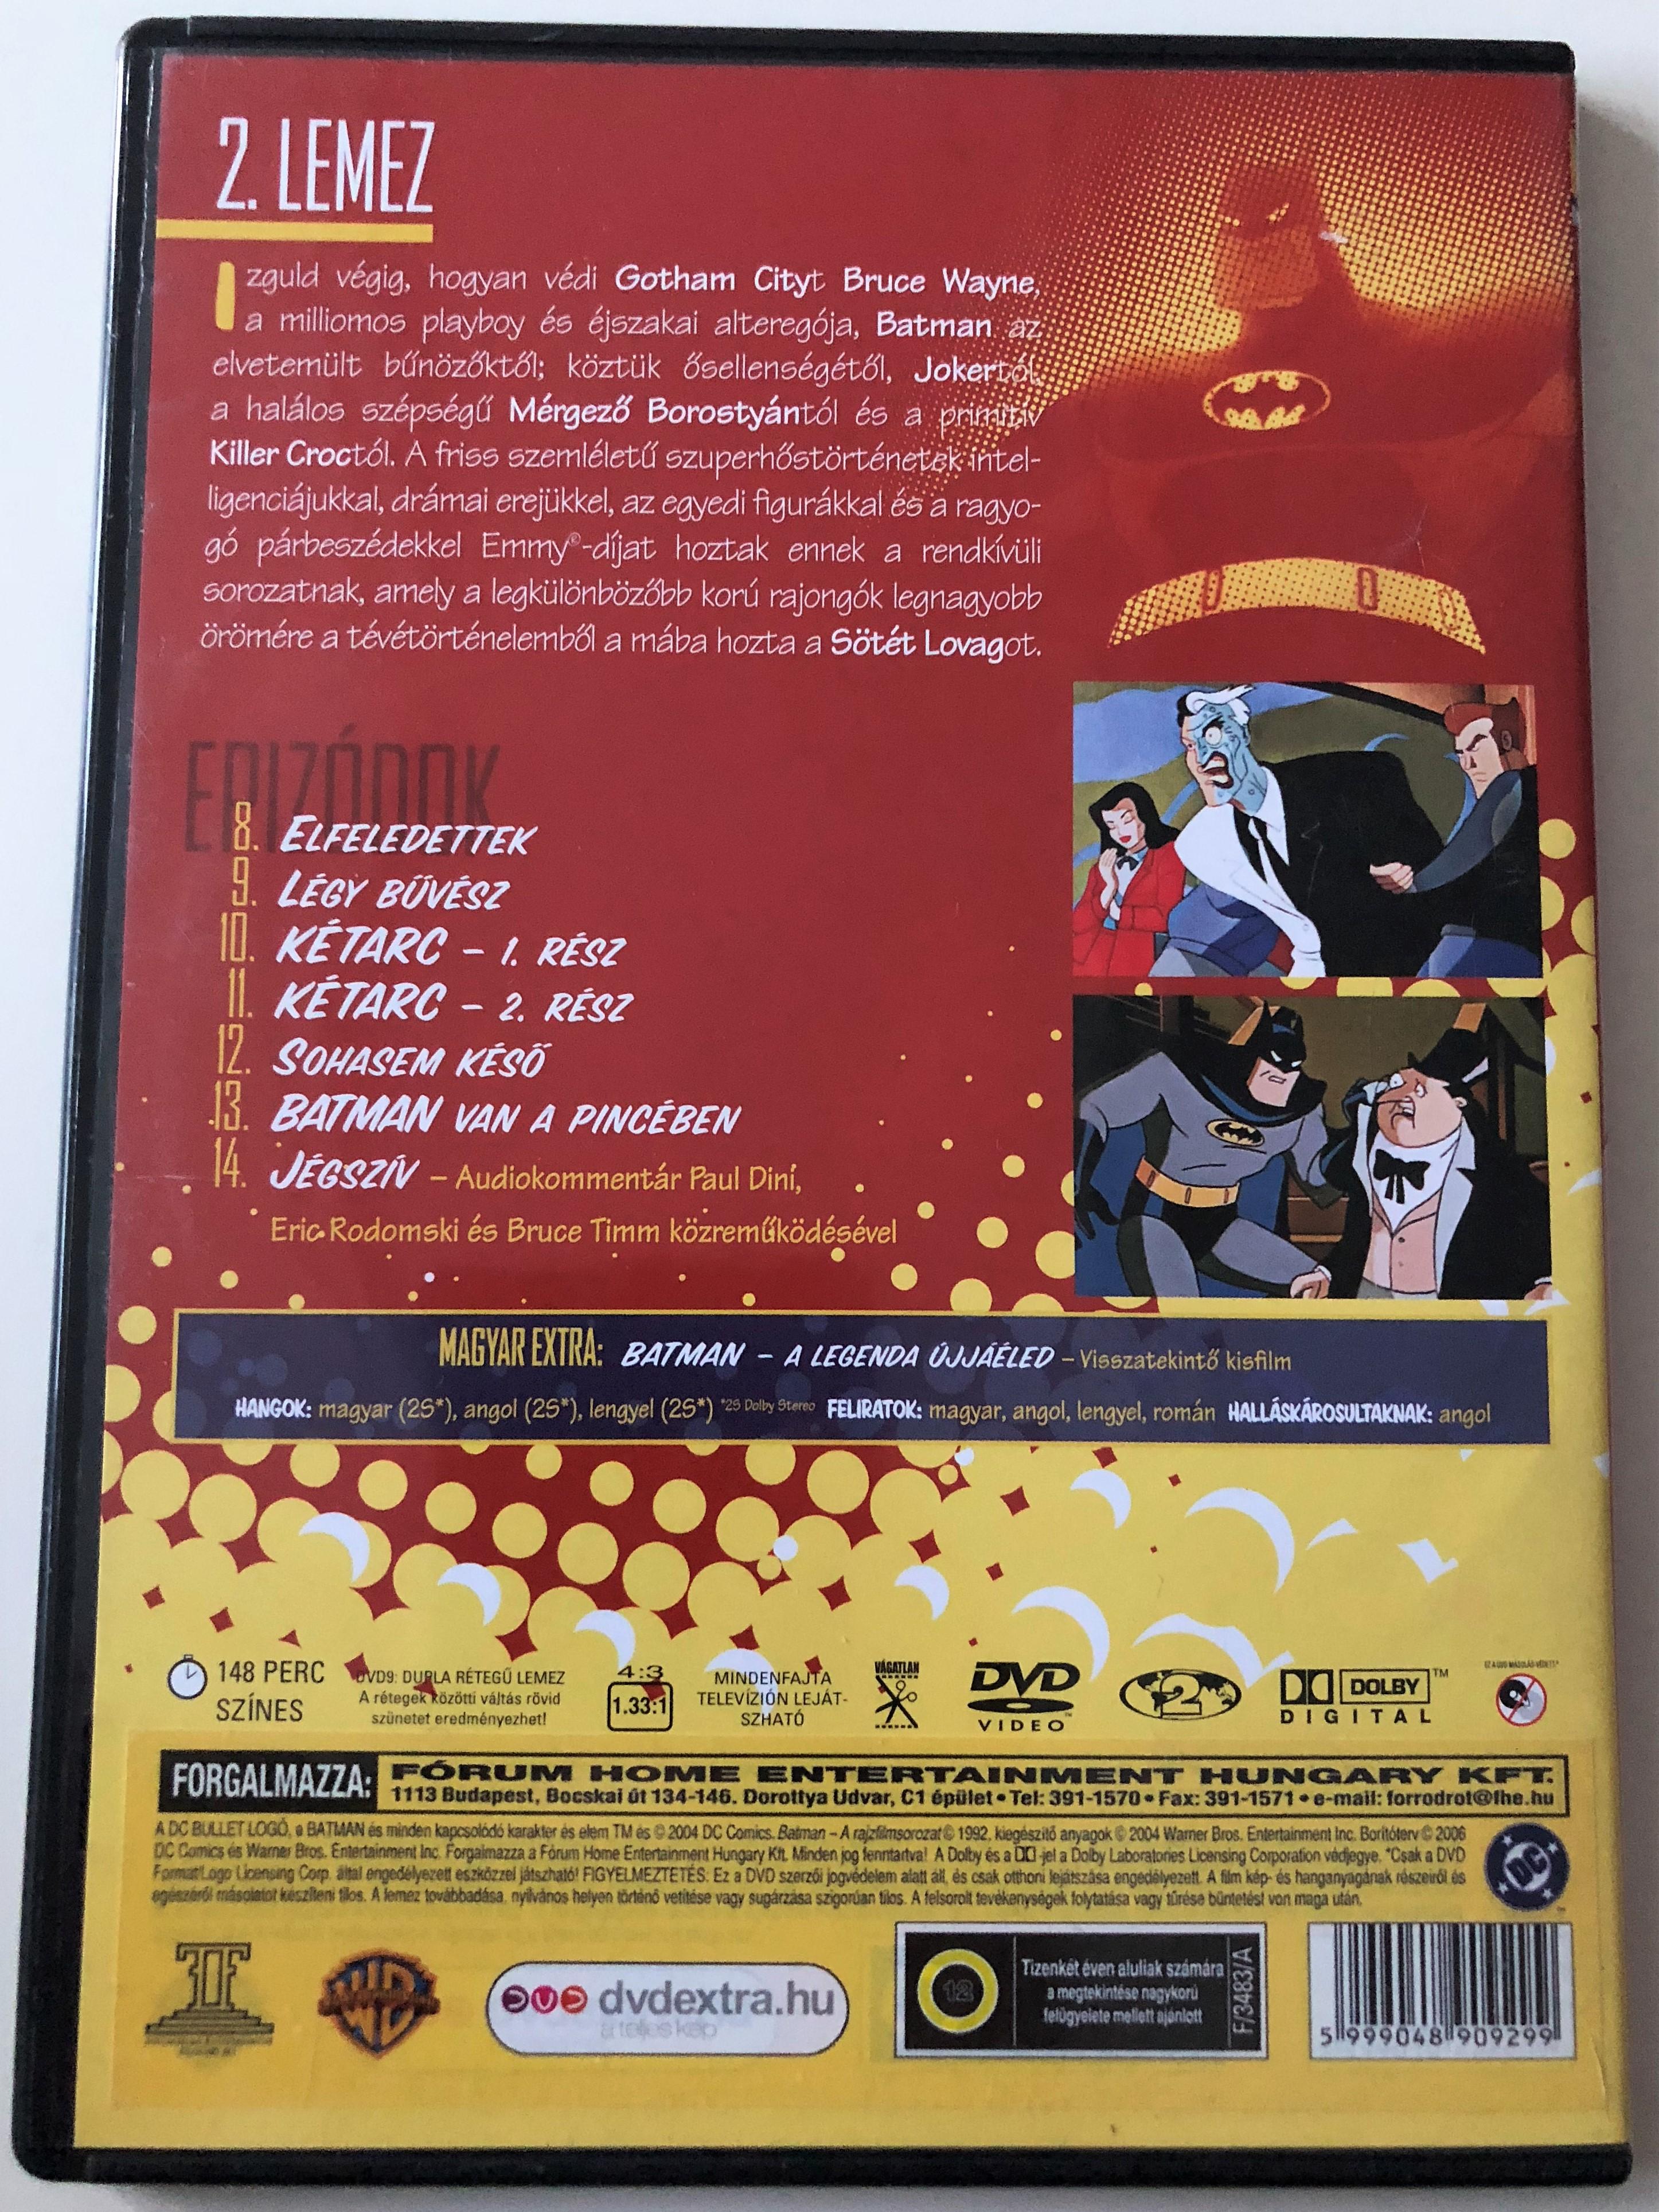 batman-the-animated-series-vol-2.-dvd-2006-batman-a-rajzfilmsorozat-2.-lemez-directed-by-bruce-w.-timm-eric-radomski-2-.jpg